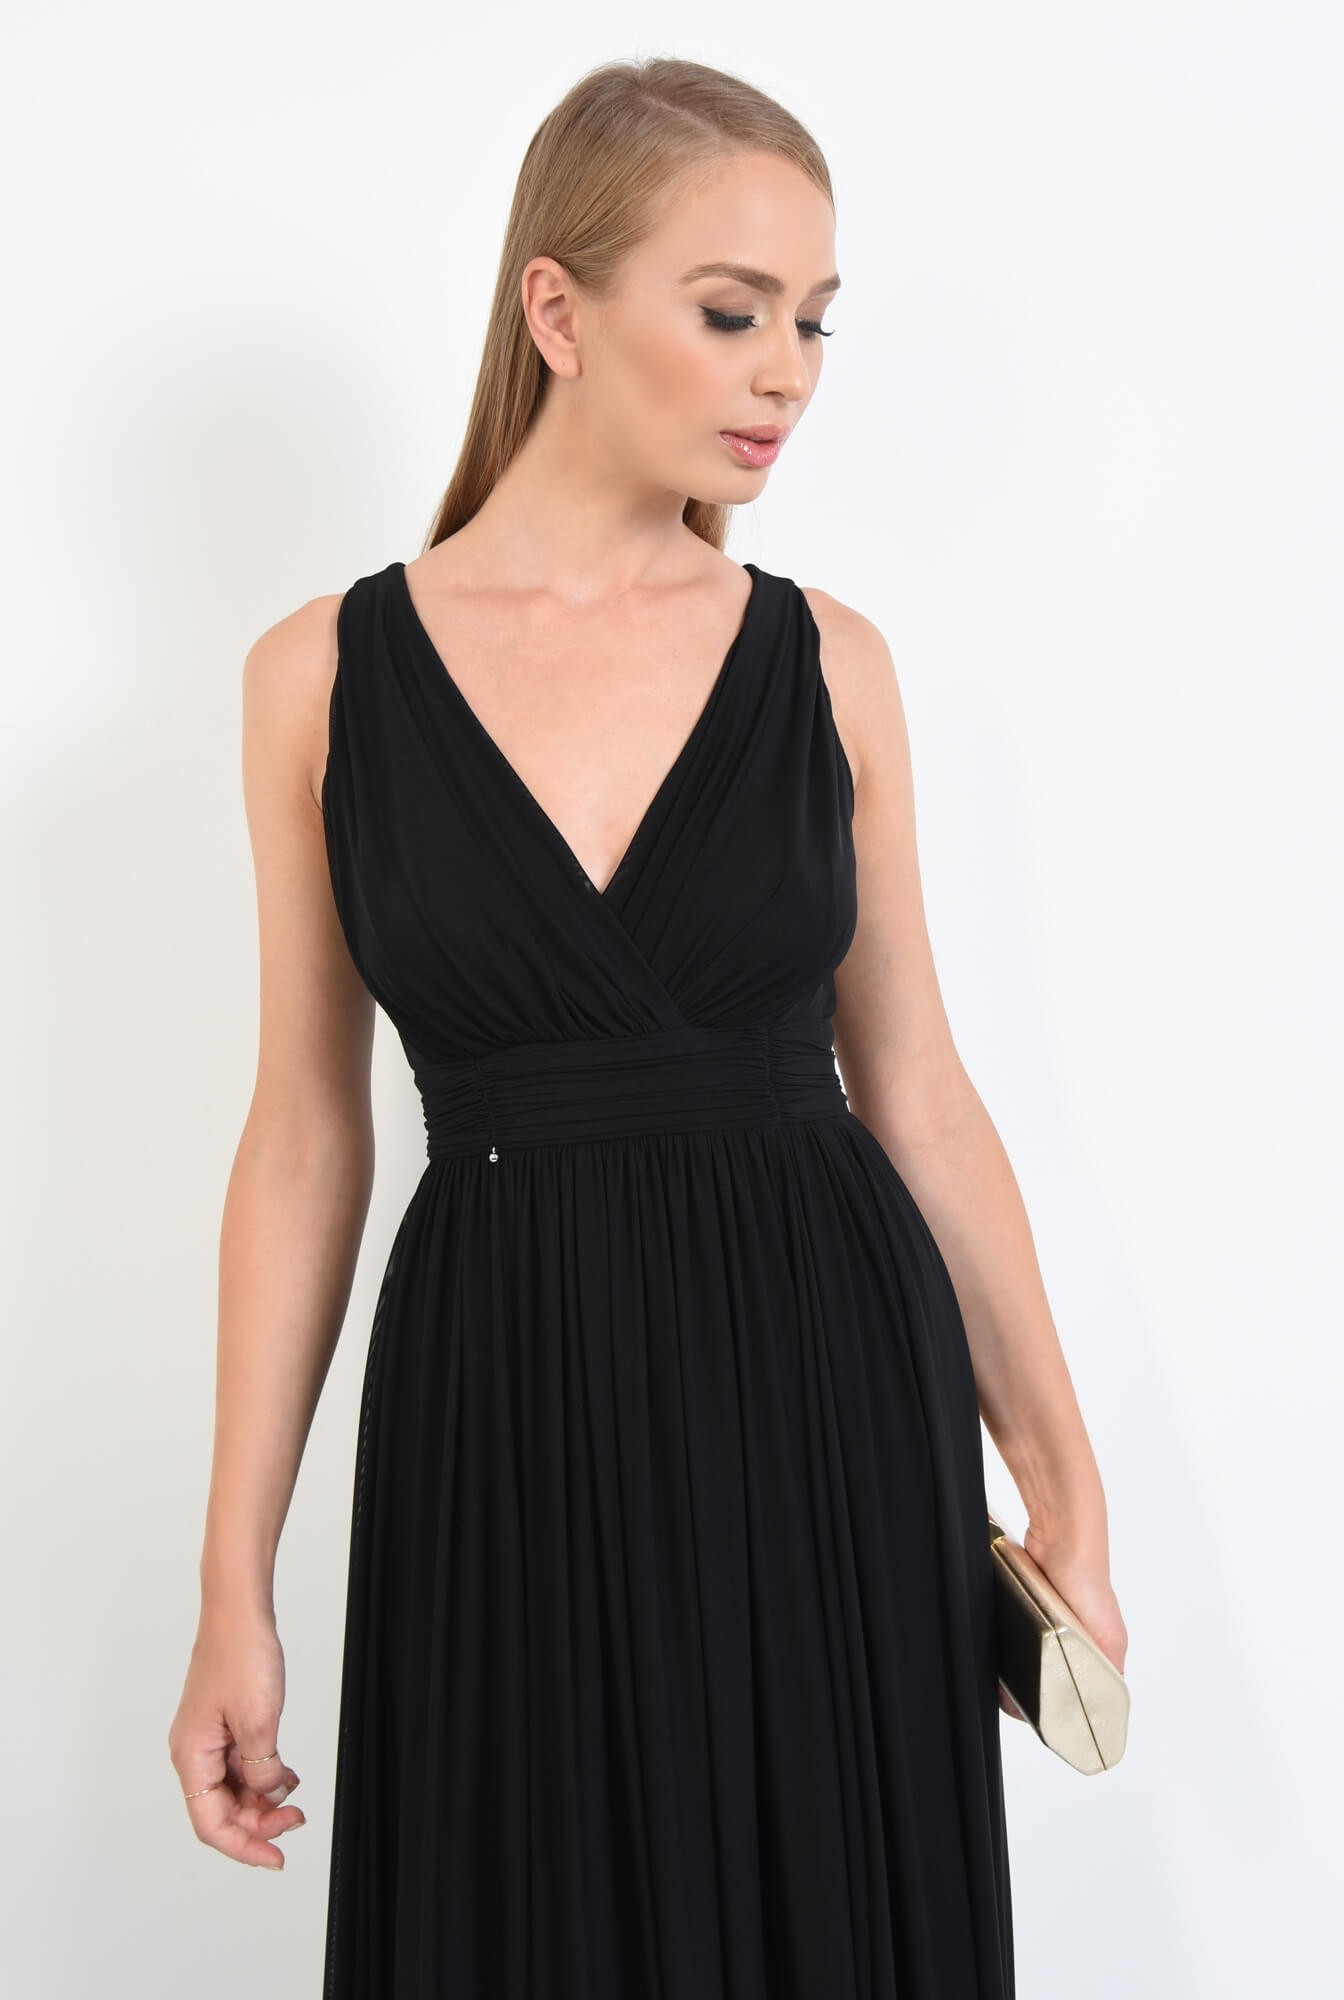 2 - rochie eleganta, lunga, tul, negru, decolteu, anchior